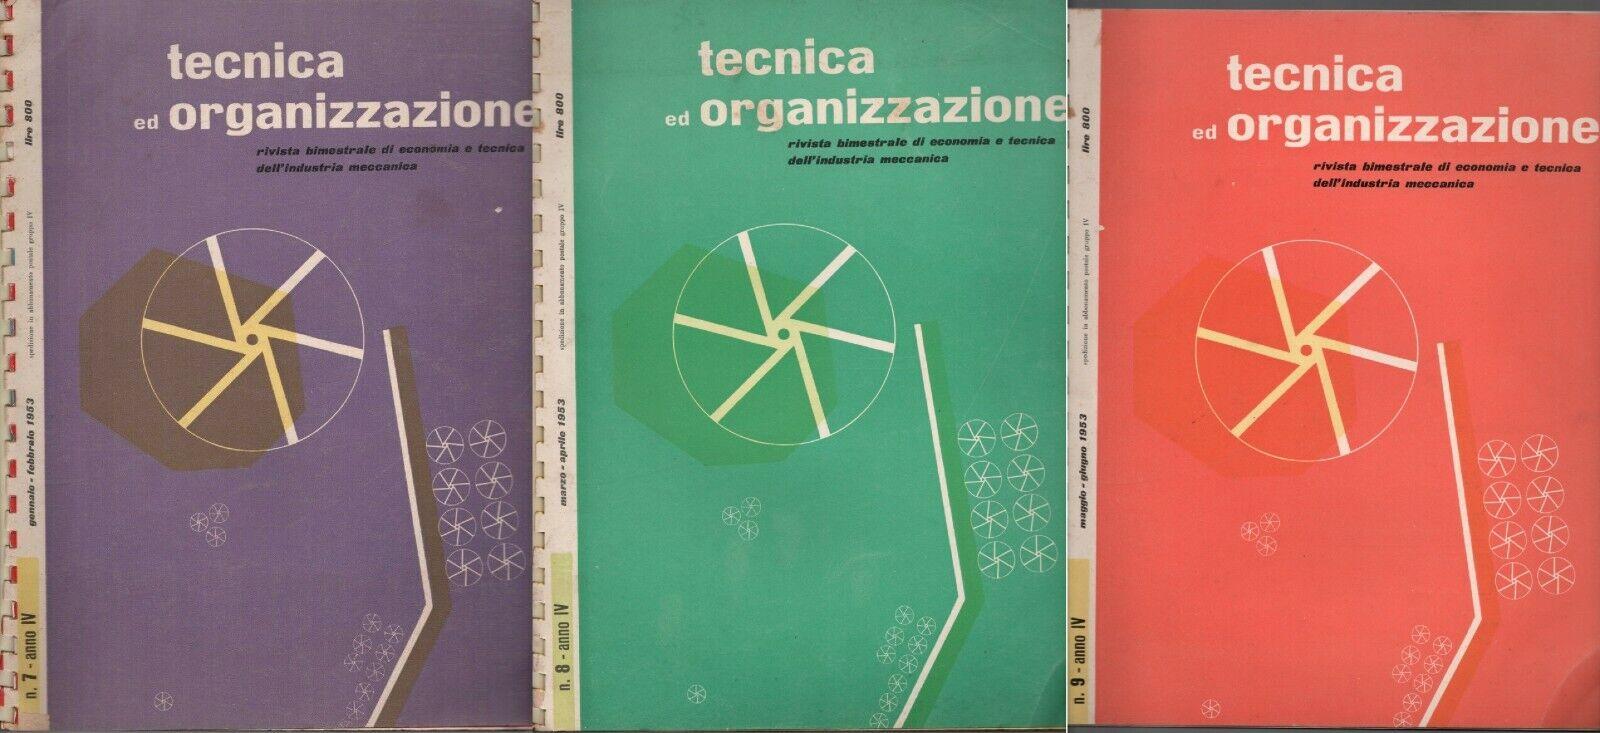 Nautical quarterly n° 4 - 6° 1987 (in italiano)